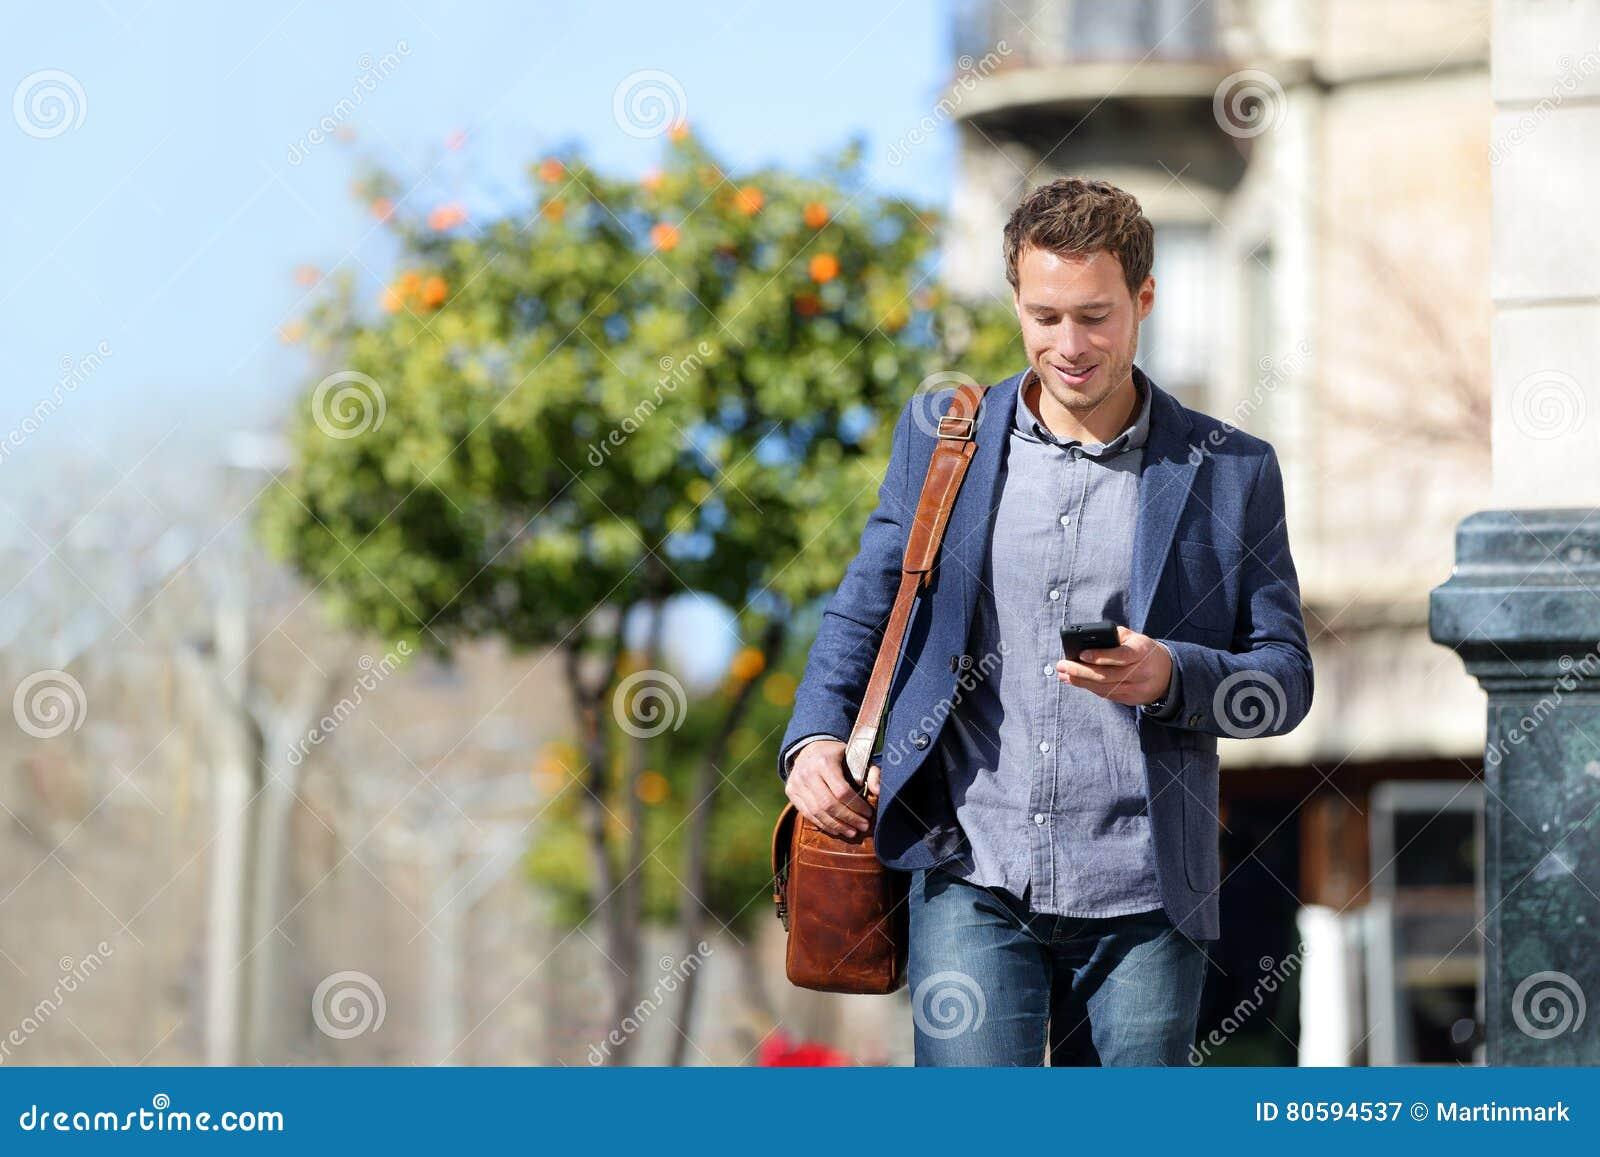 Business man using mobile phone walking to work